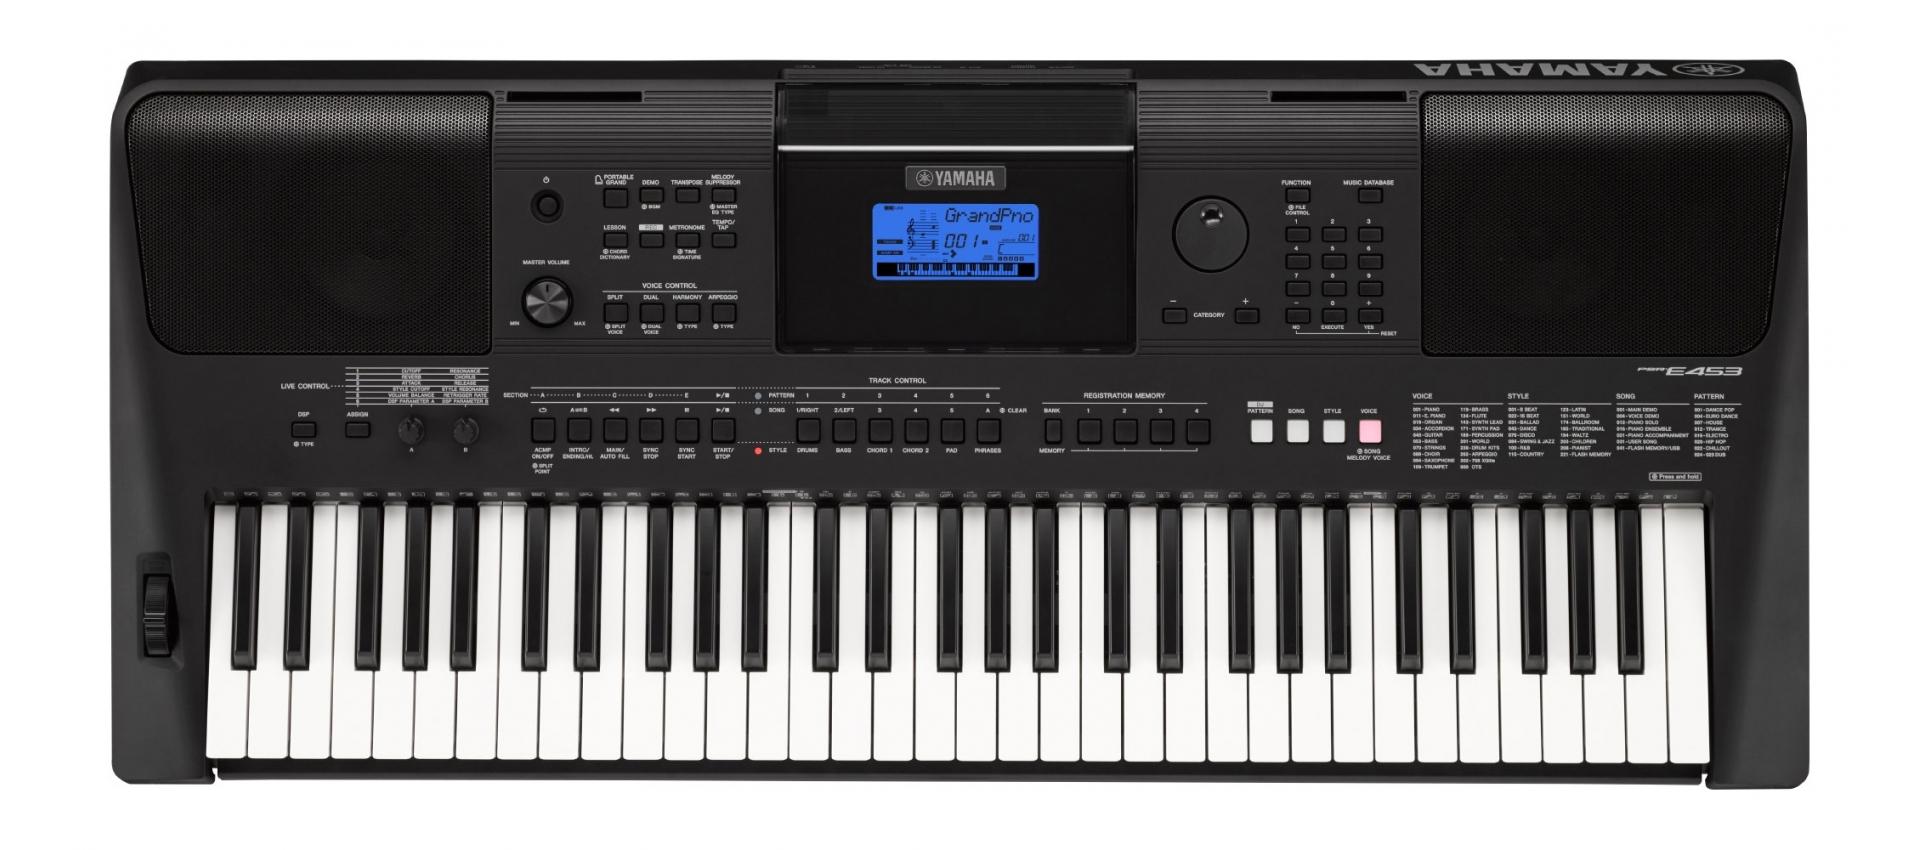 yamaha psr e453 digital keyboard 61 keys luckymusic. Black Bedroom Furniture Sets. Home Design Ideas